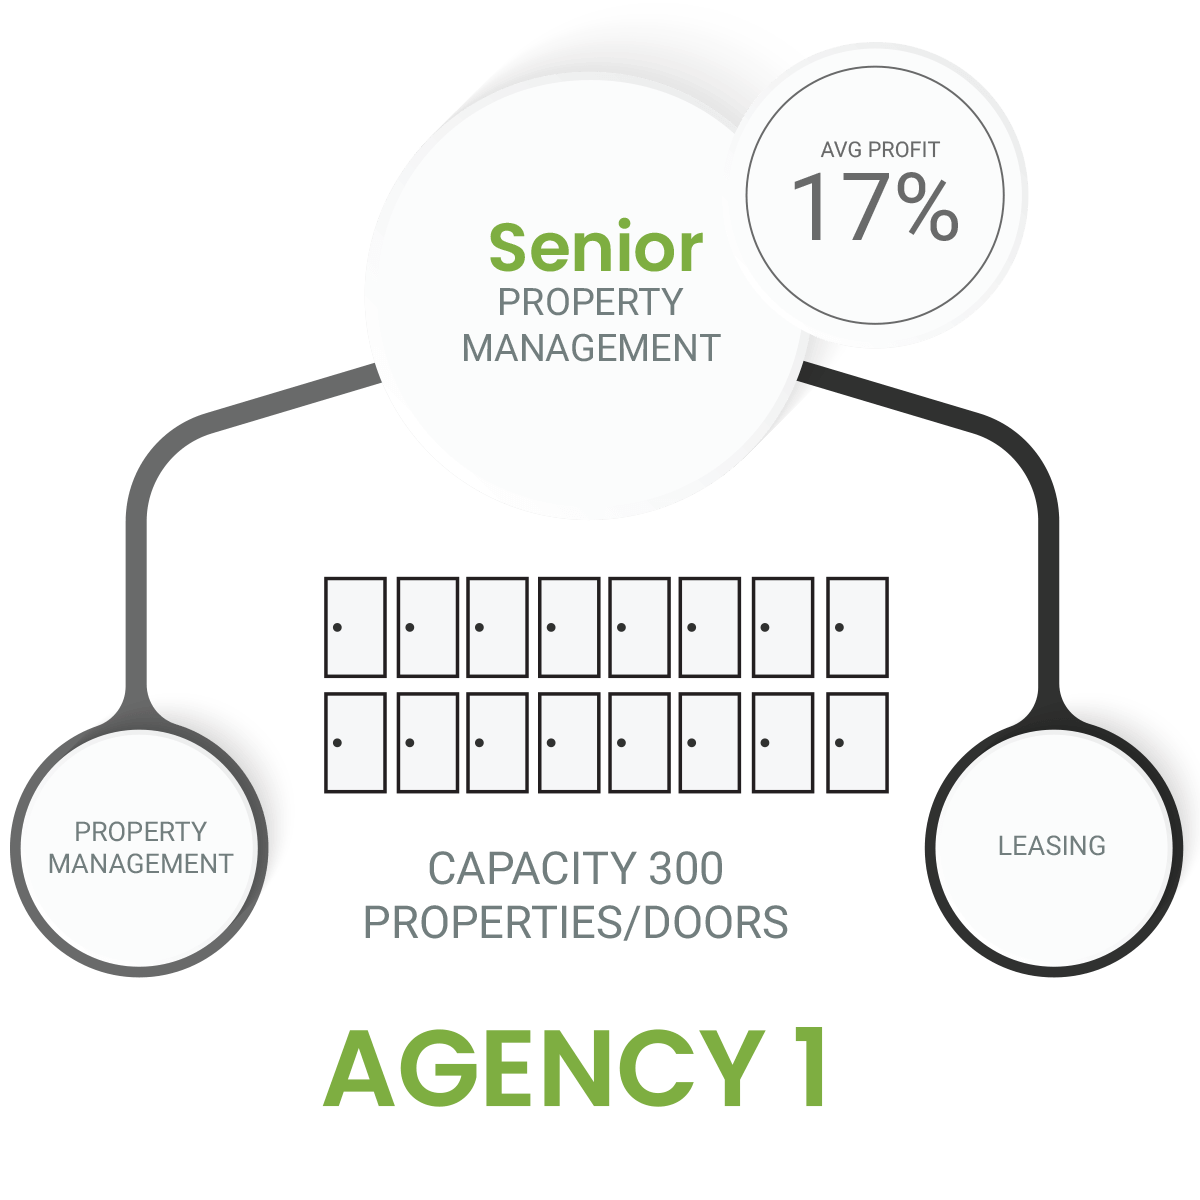 Senior Property Management capacity properties